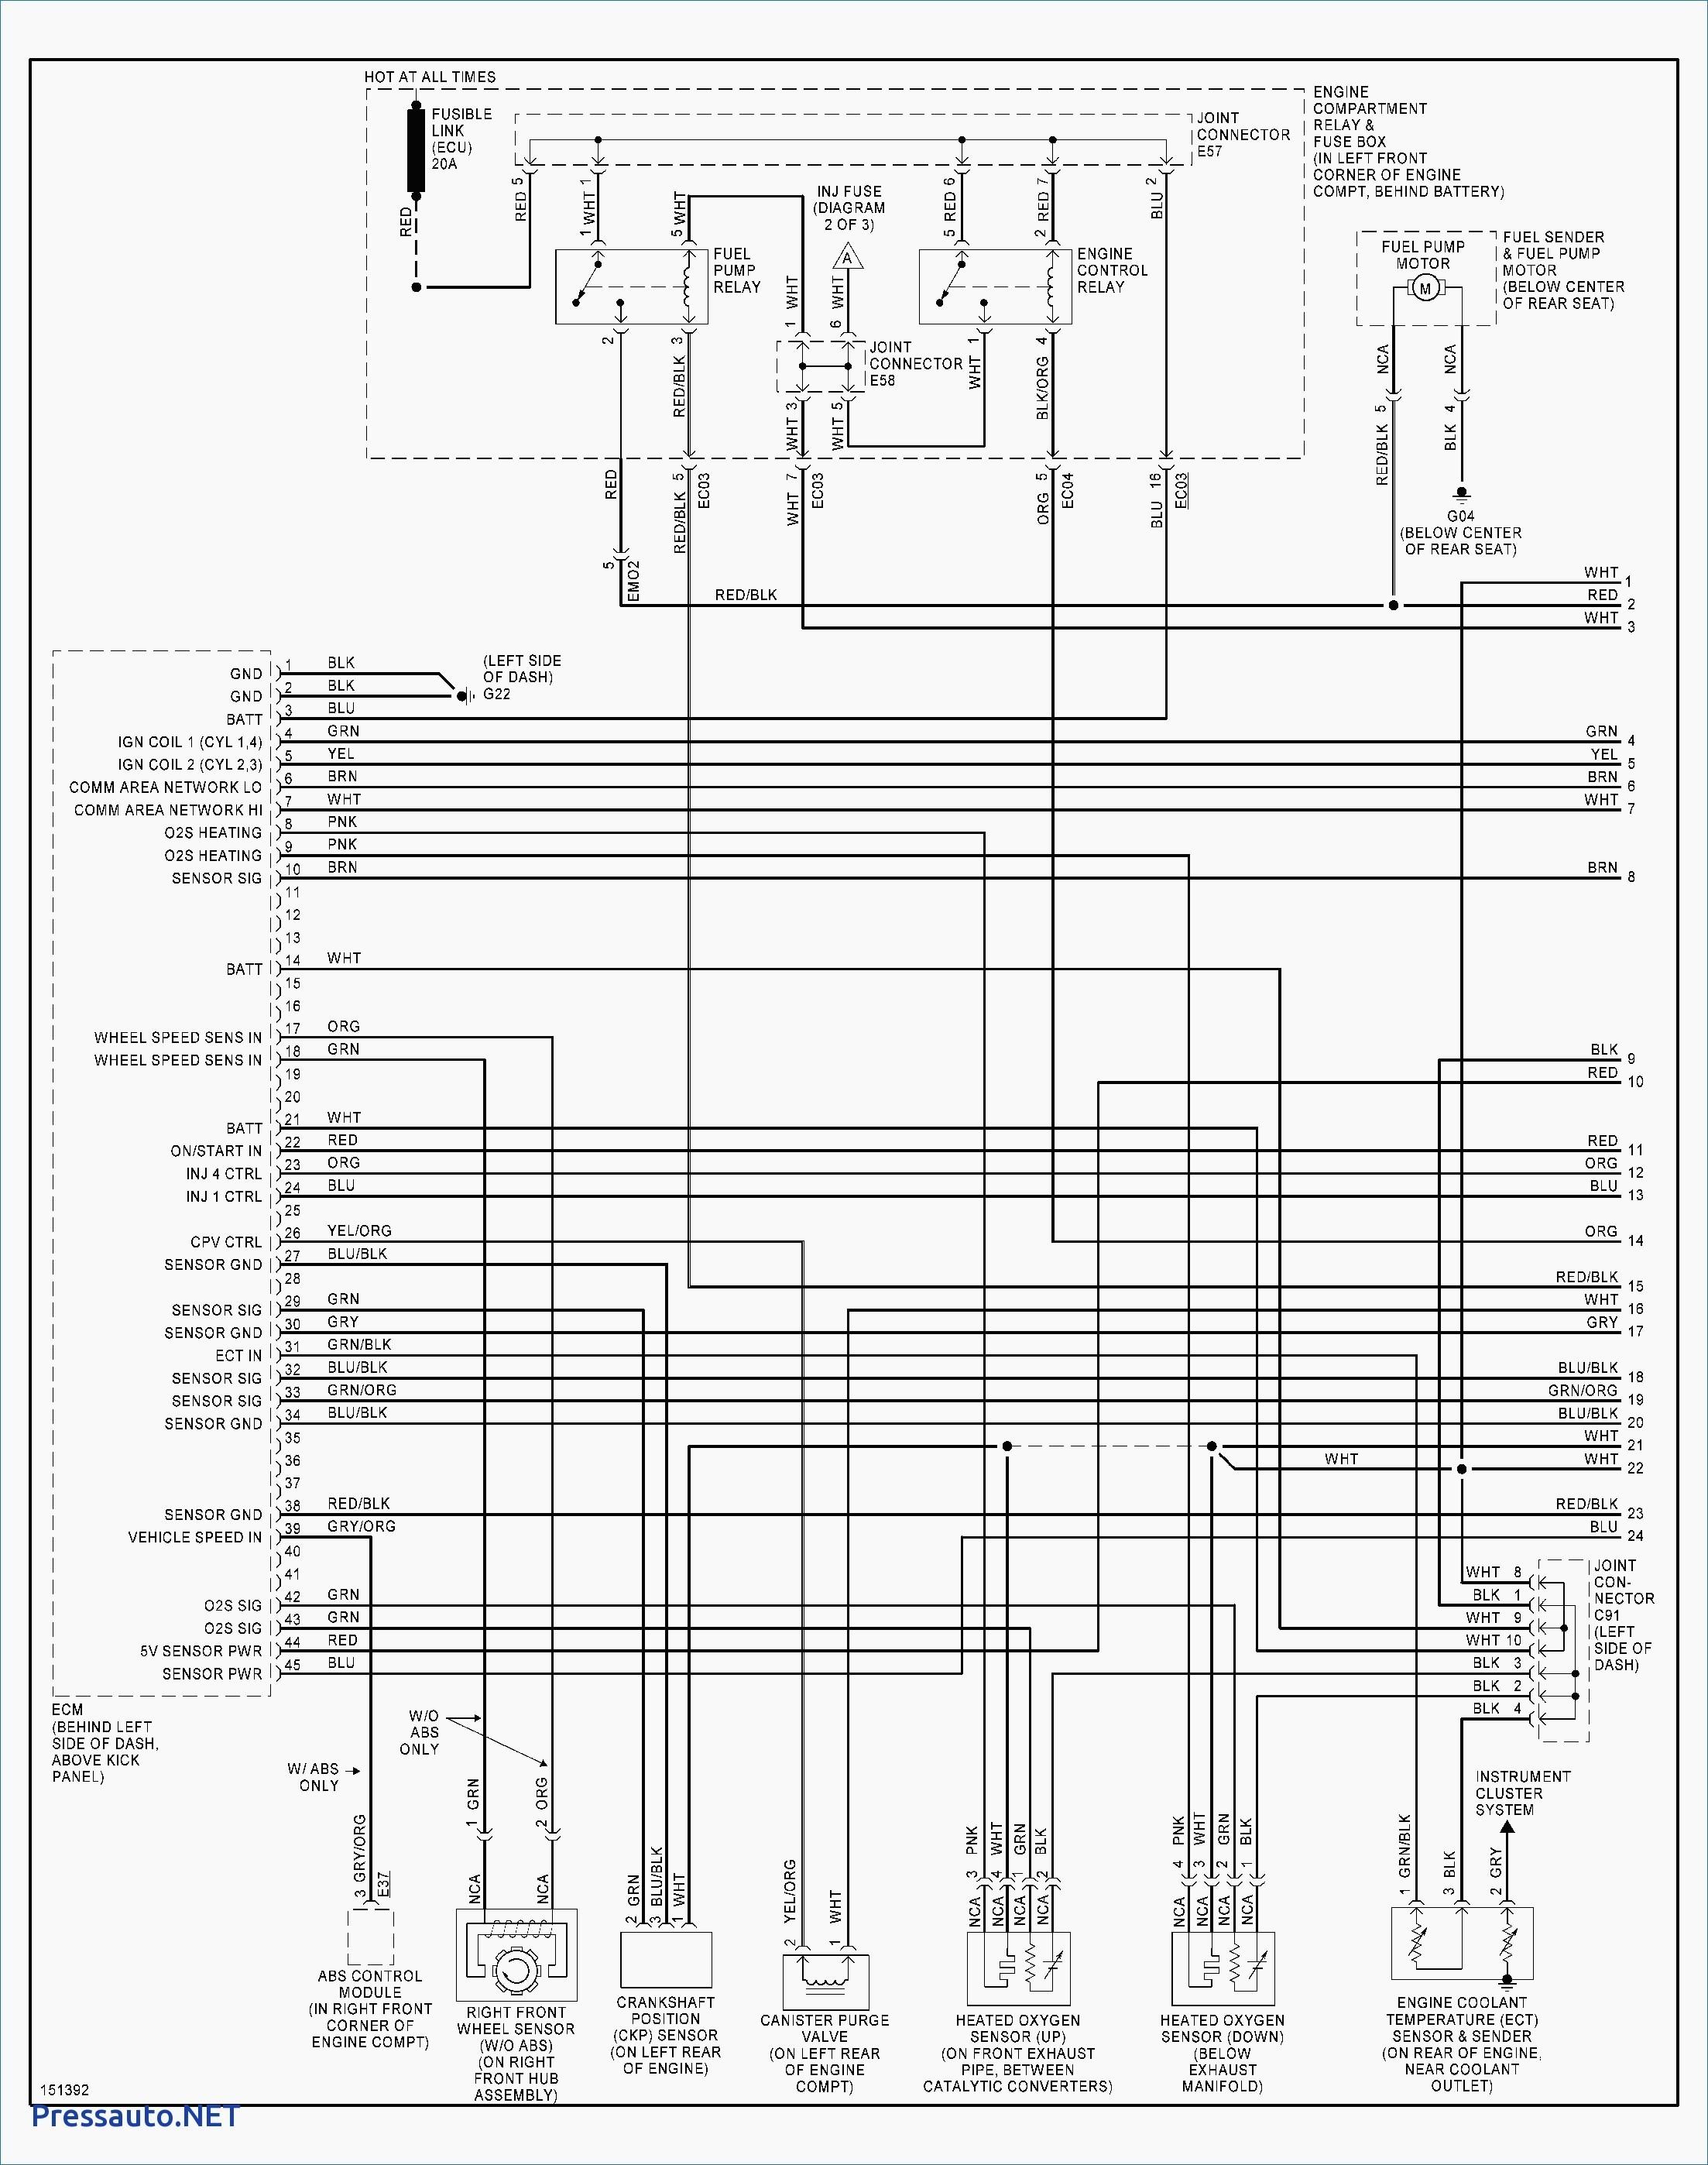 Hyundai Accent Engine Diagram 2005 Hyundai sonata Wiring Diagram Wire Data • Of Hyundai Accent Engine Diagram